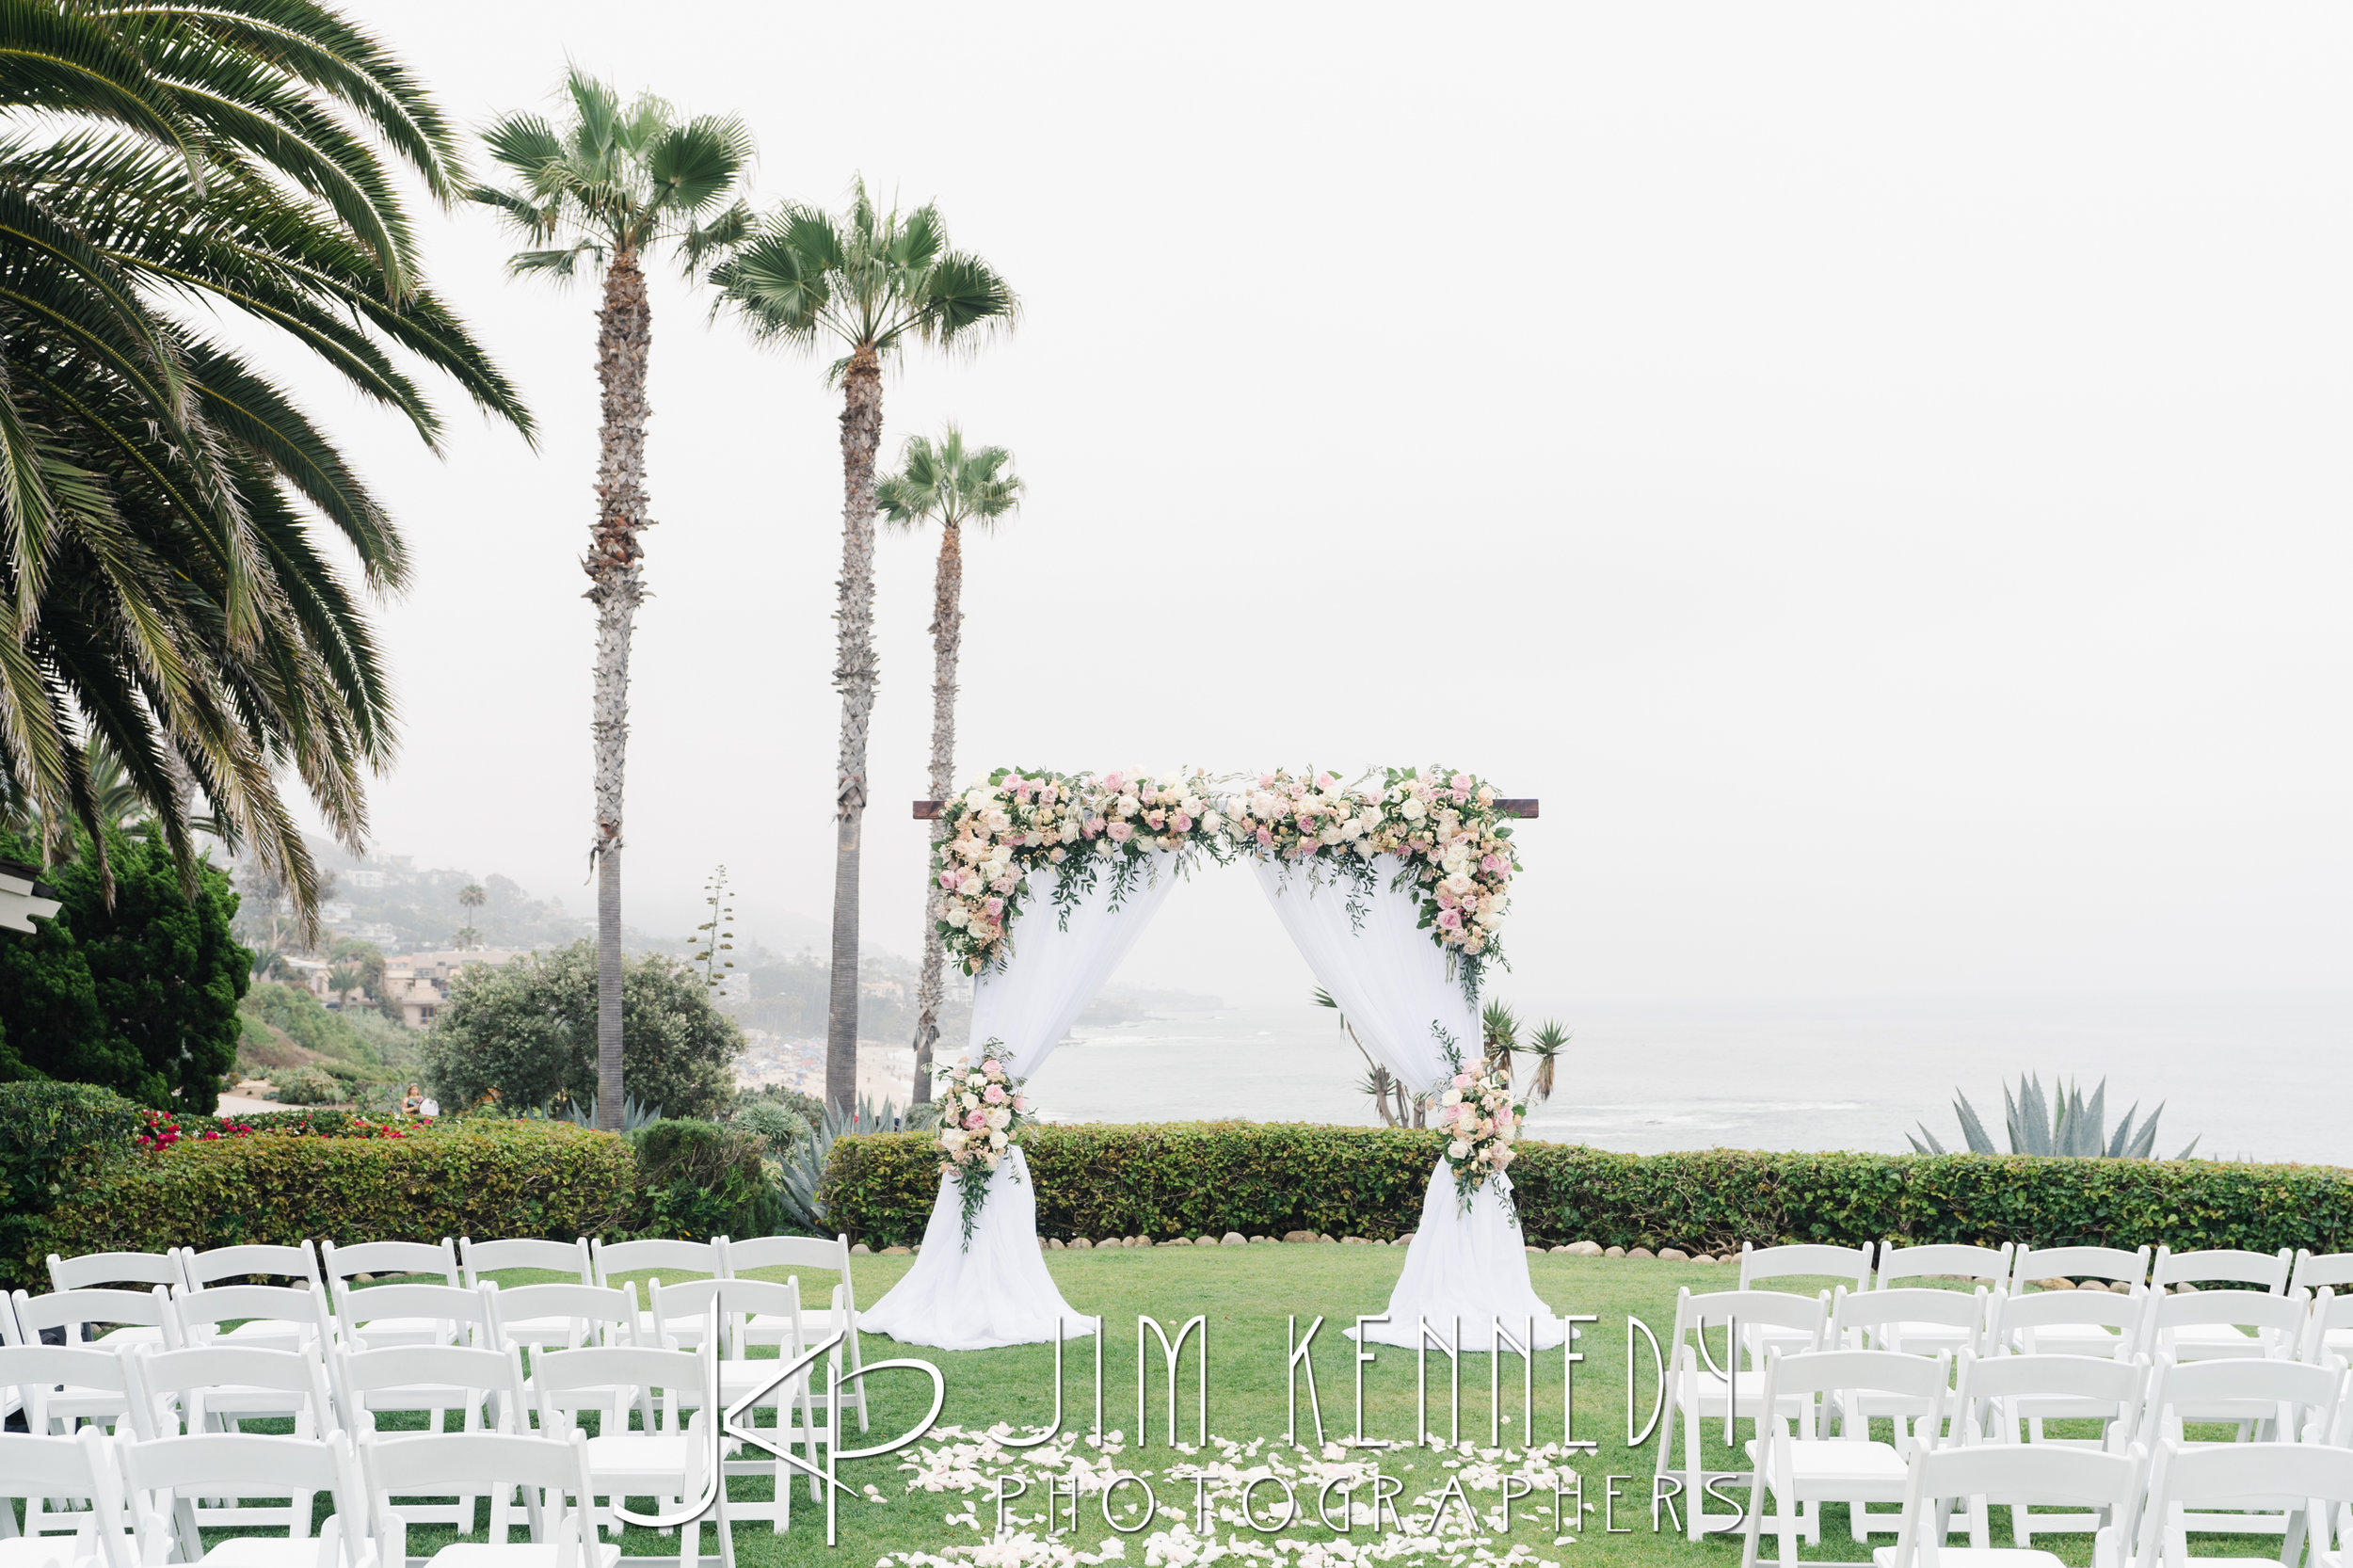 montage-laguna-beach-wedding-josette-nick_0113.JPG